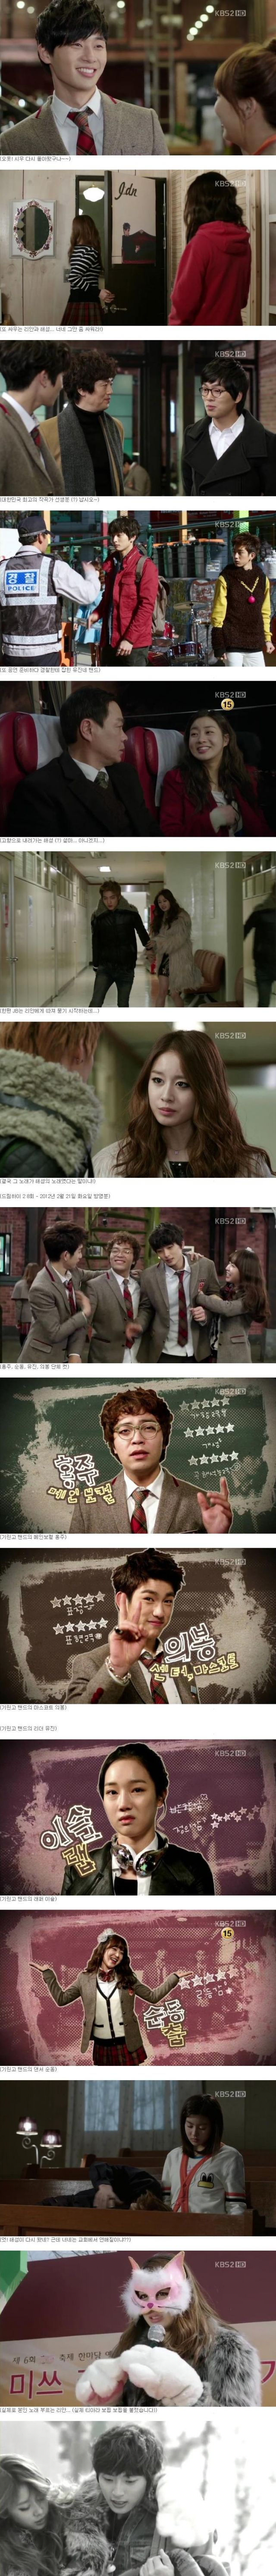 Spoiler] Added episode 8 captures for the Korean drama